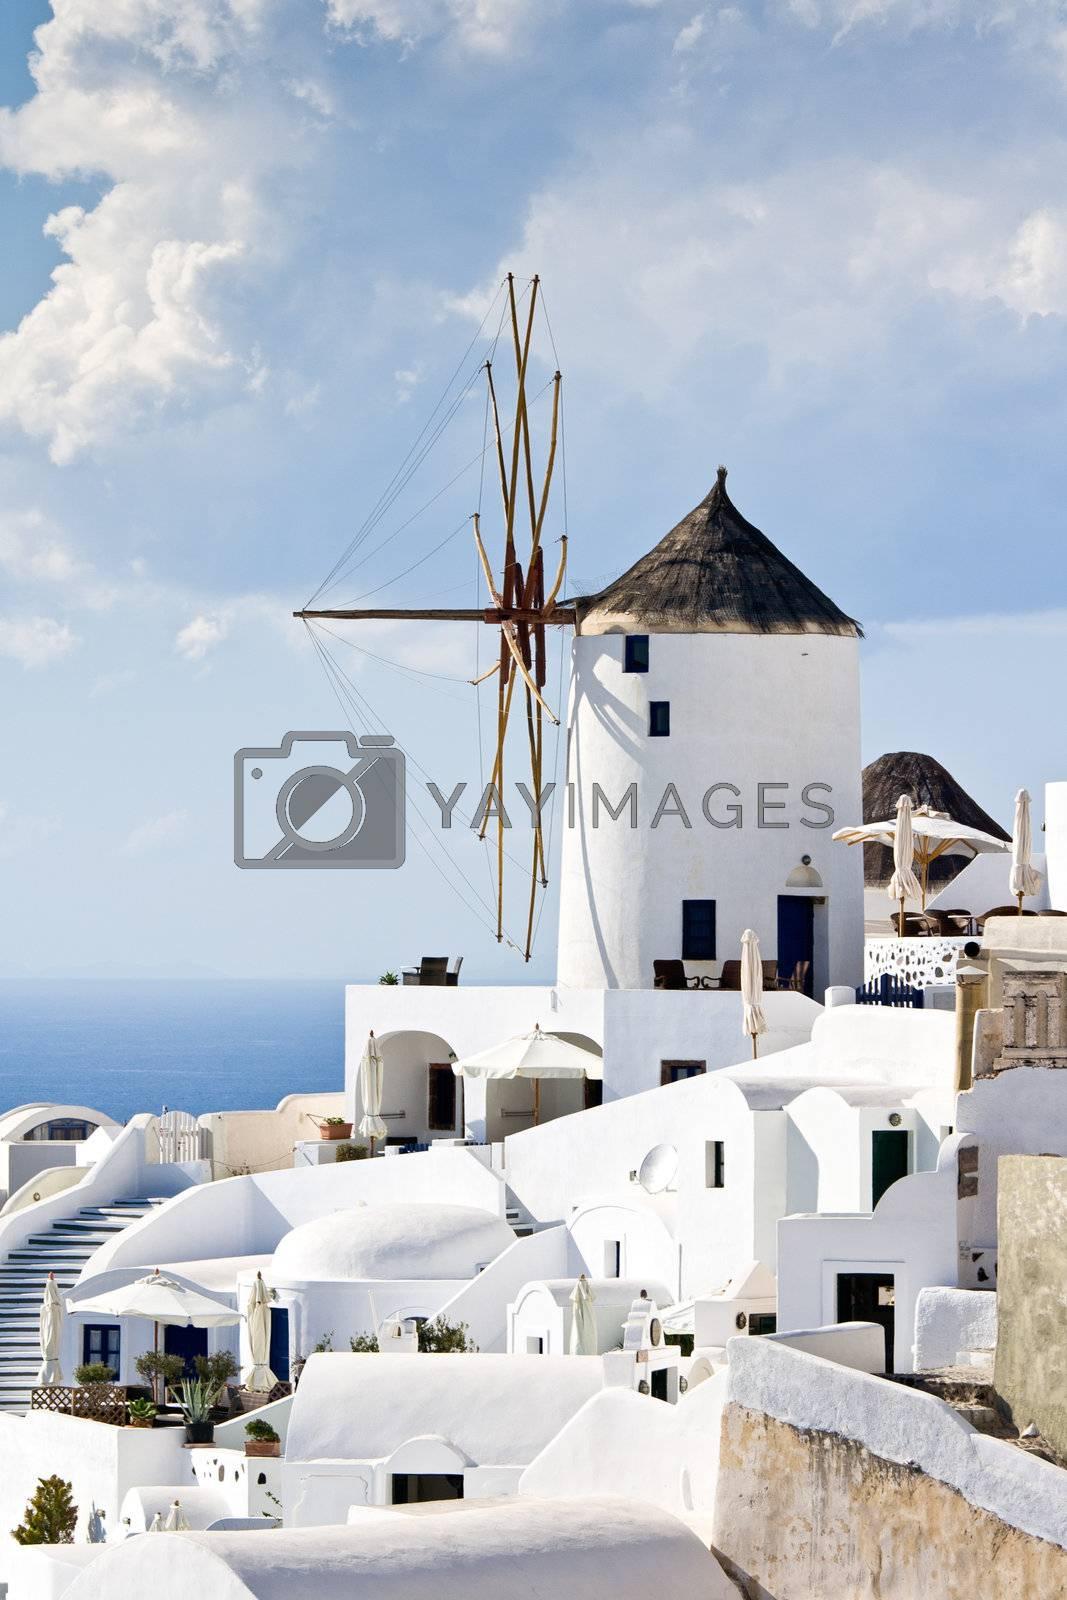 Traditional windmills in village Oia of Cyclades island Santorin by SergeyAK